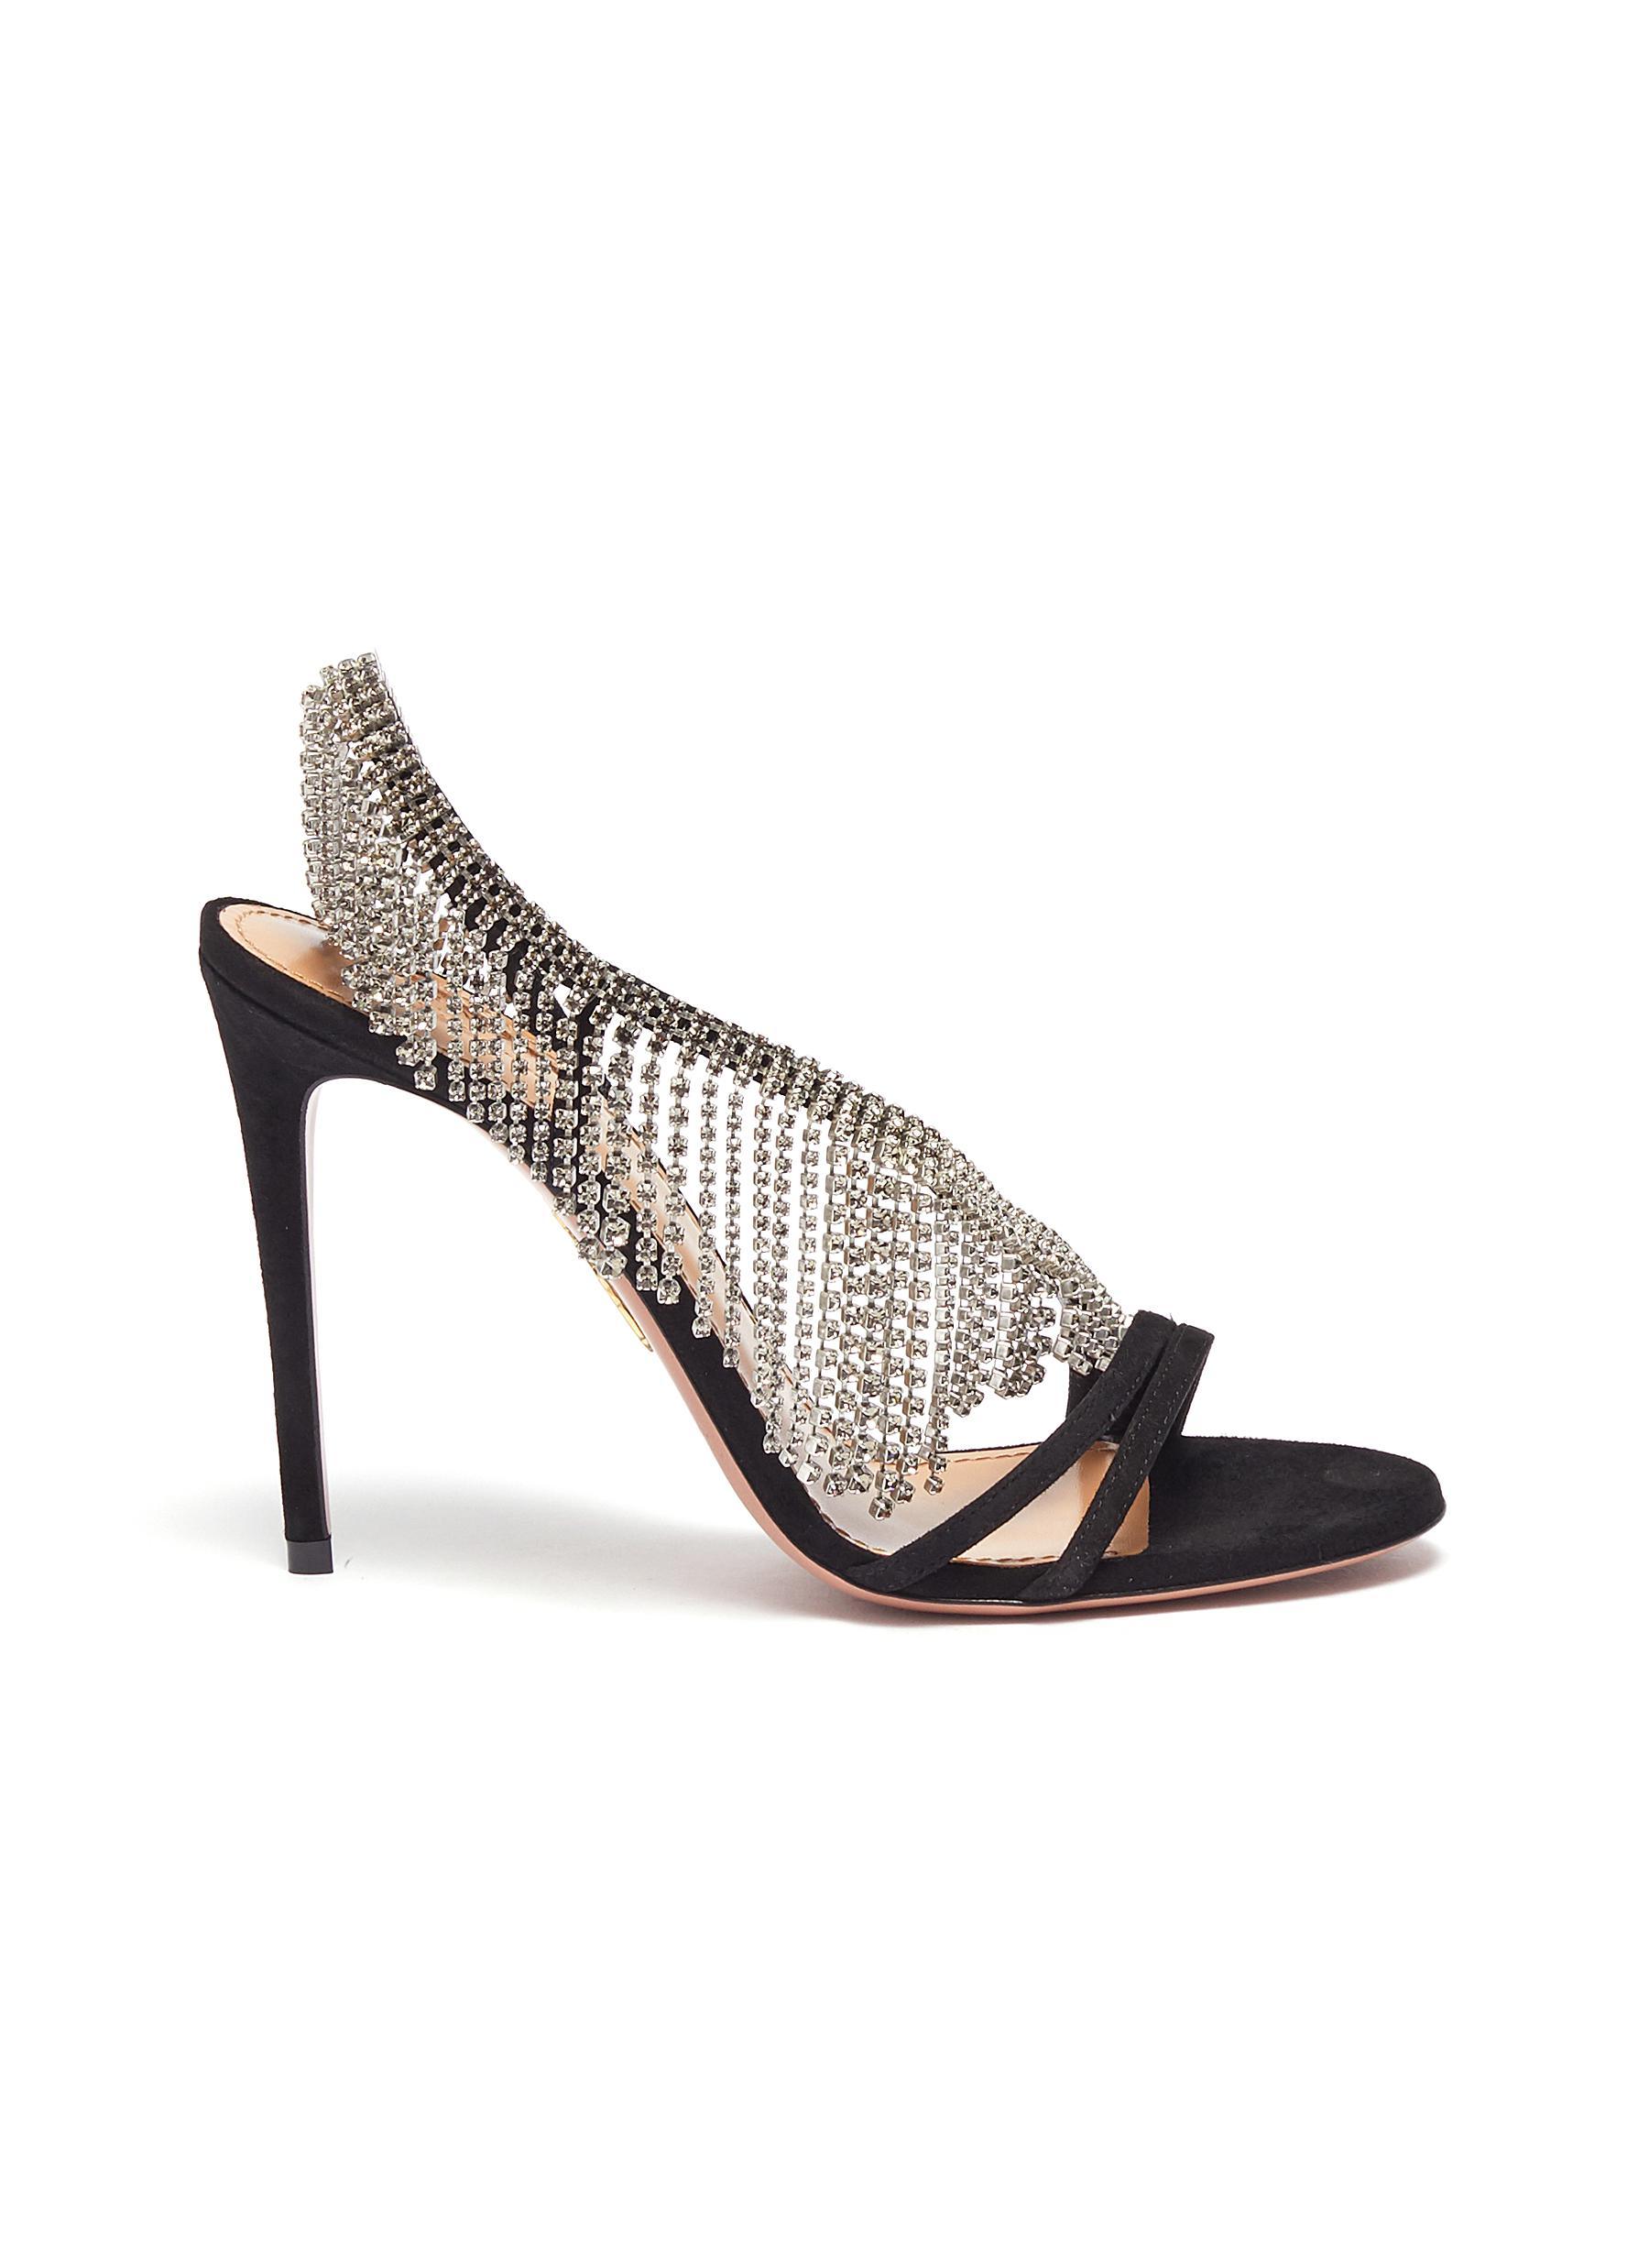 Wild glass crystal fringe suede strappy sandals by Aquazzura